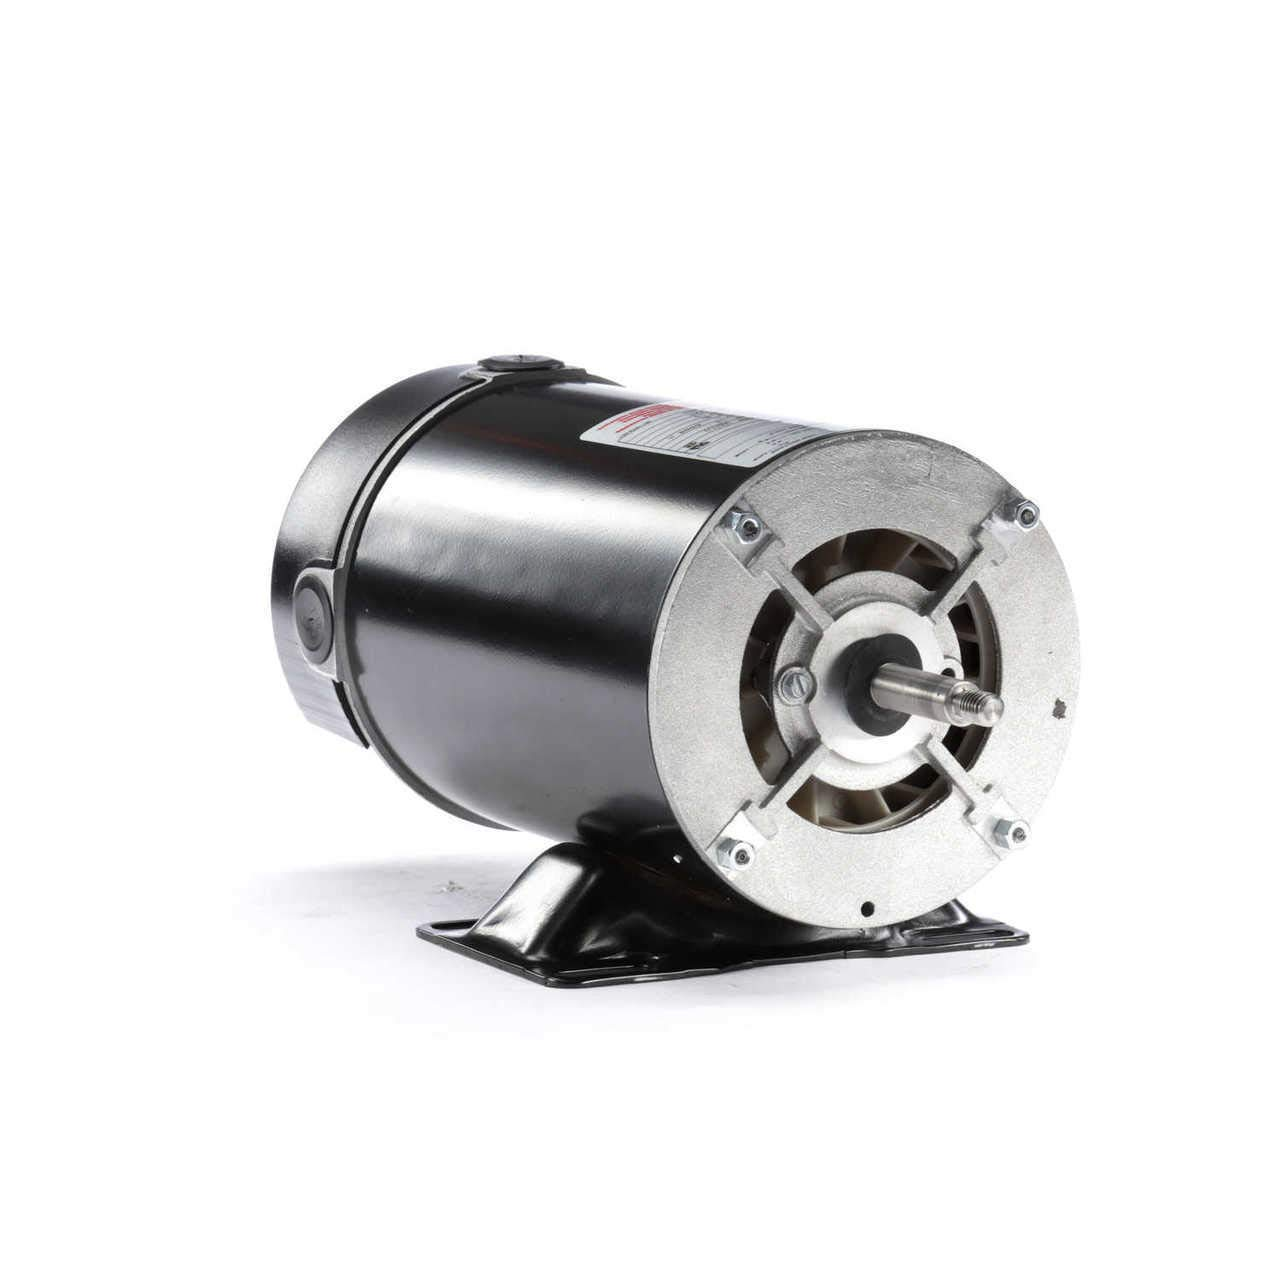 Pool Pump Motor, 1-1/2 HP, 3450, 115/230V